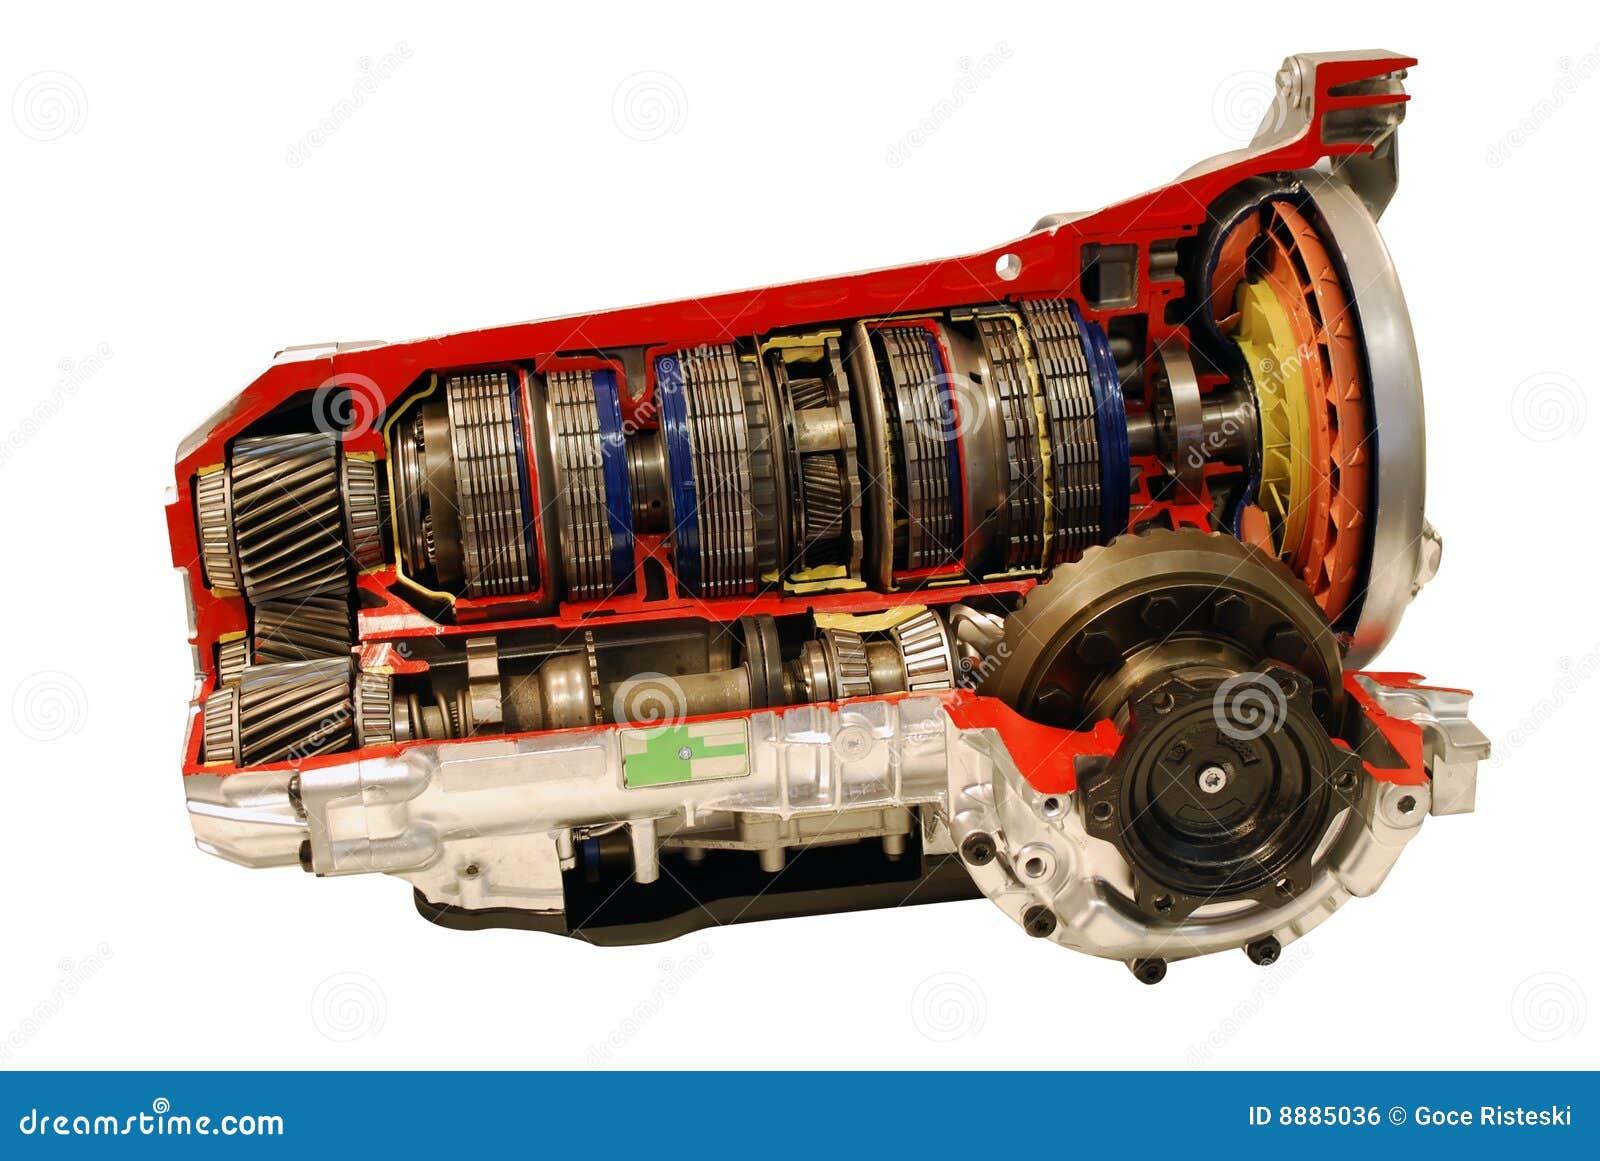 car-transmission-part-8885036 Nissan Nx Wiring Diagram on